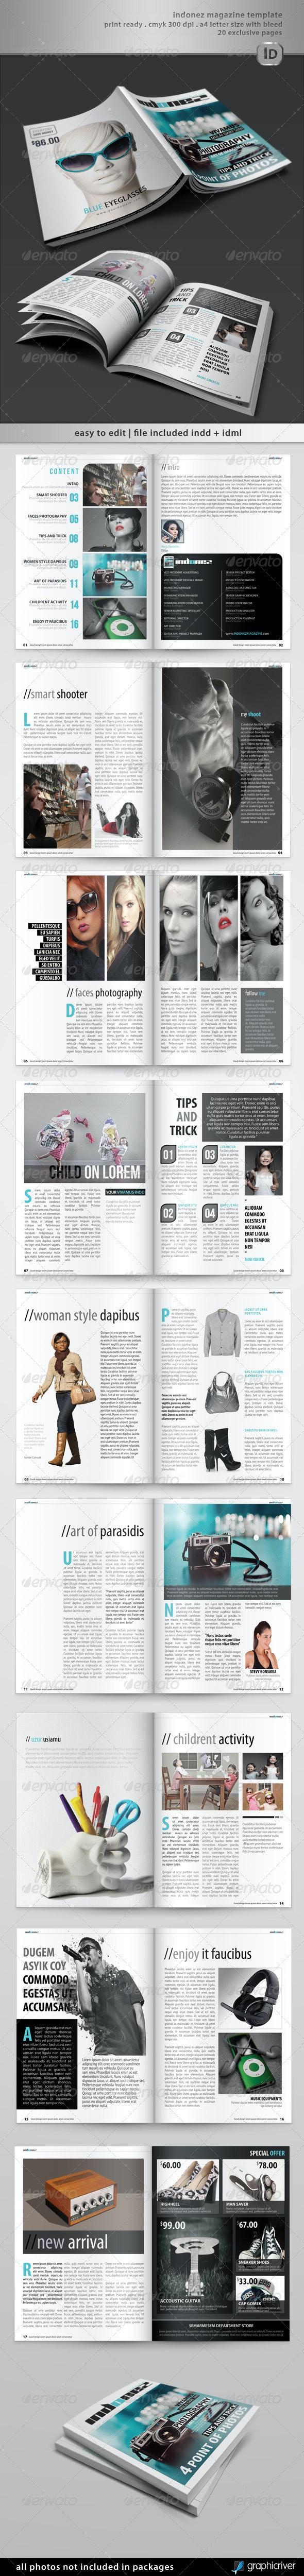 Indonez Magazine Template - Magazines Print Templates